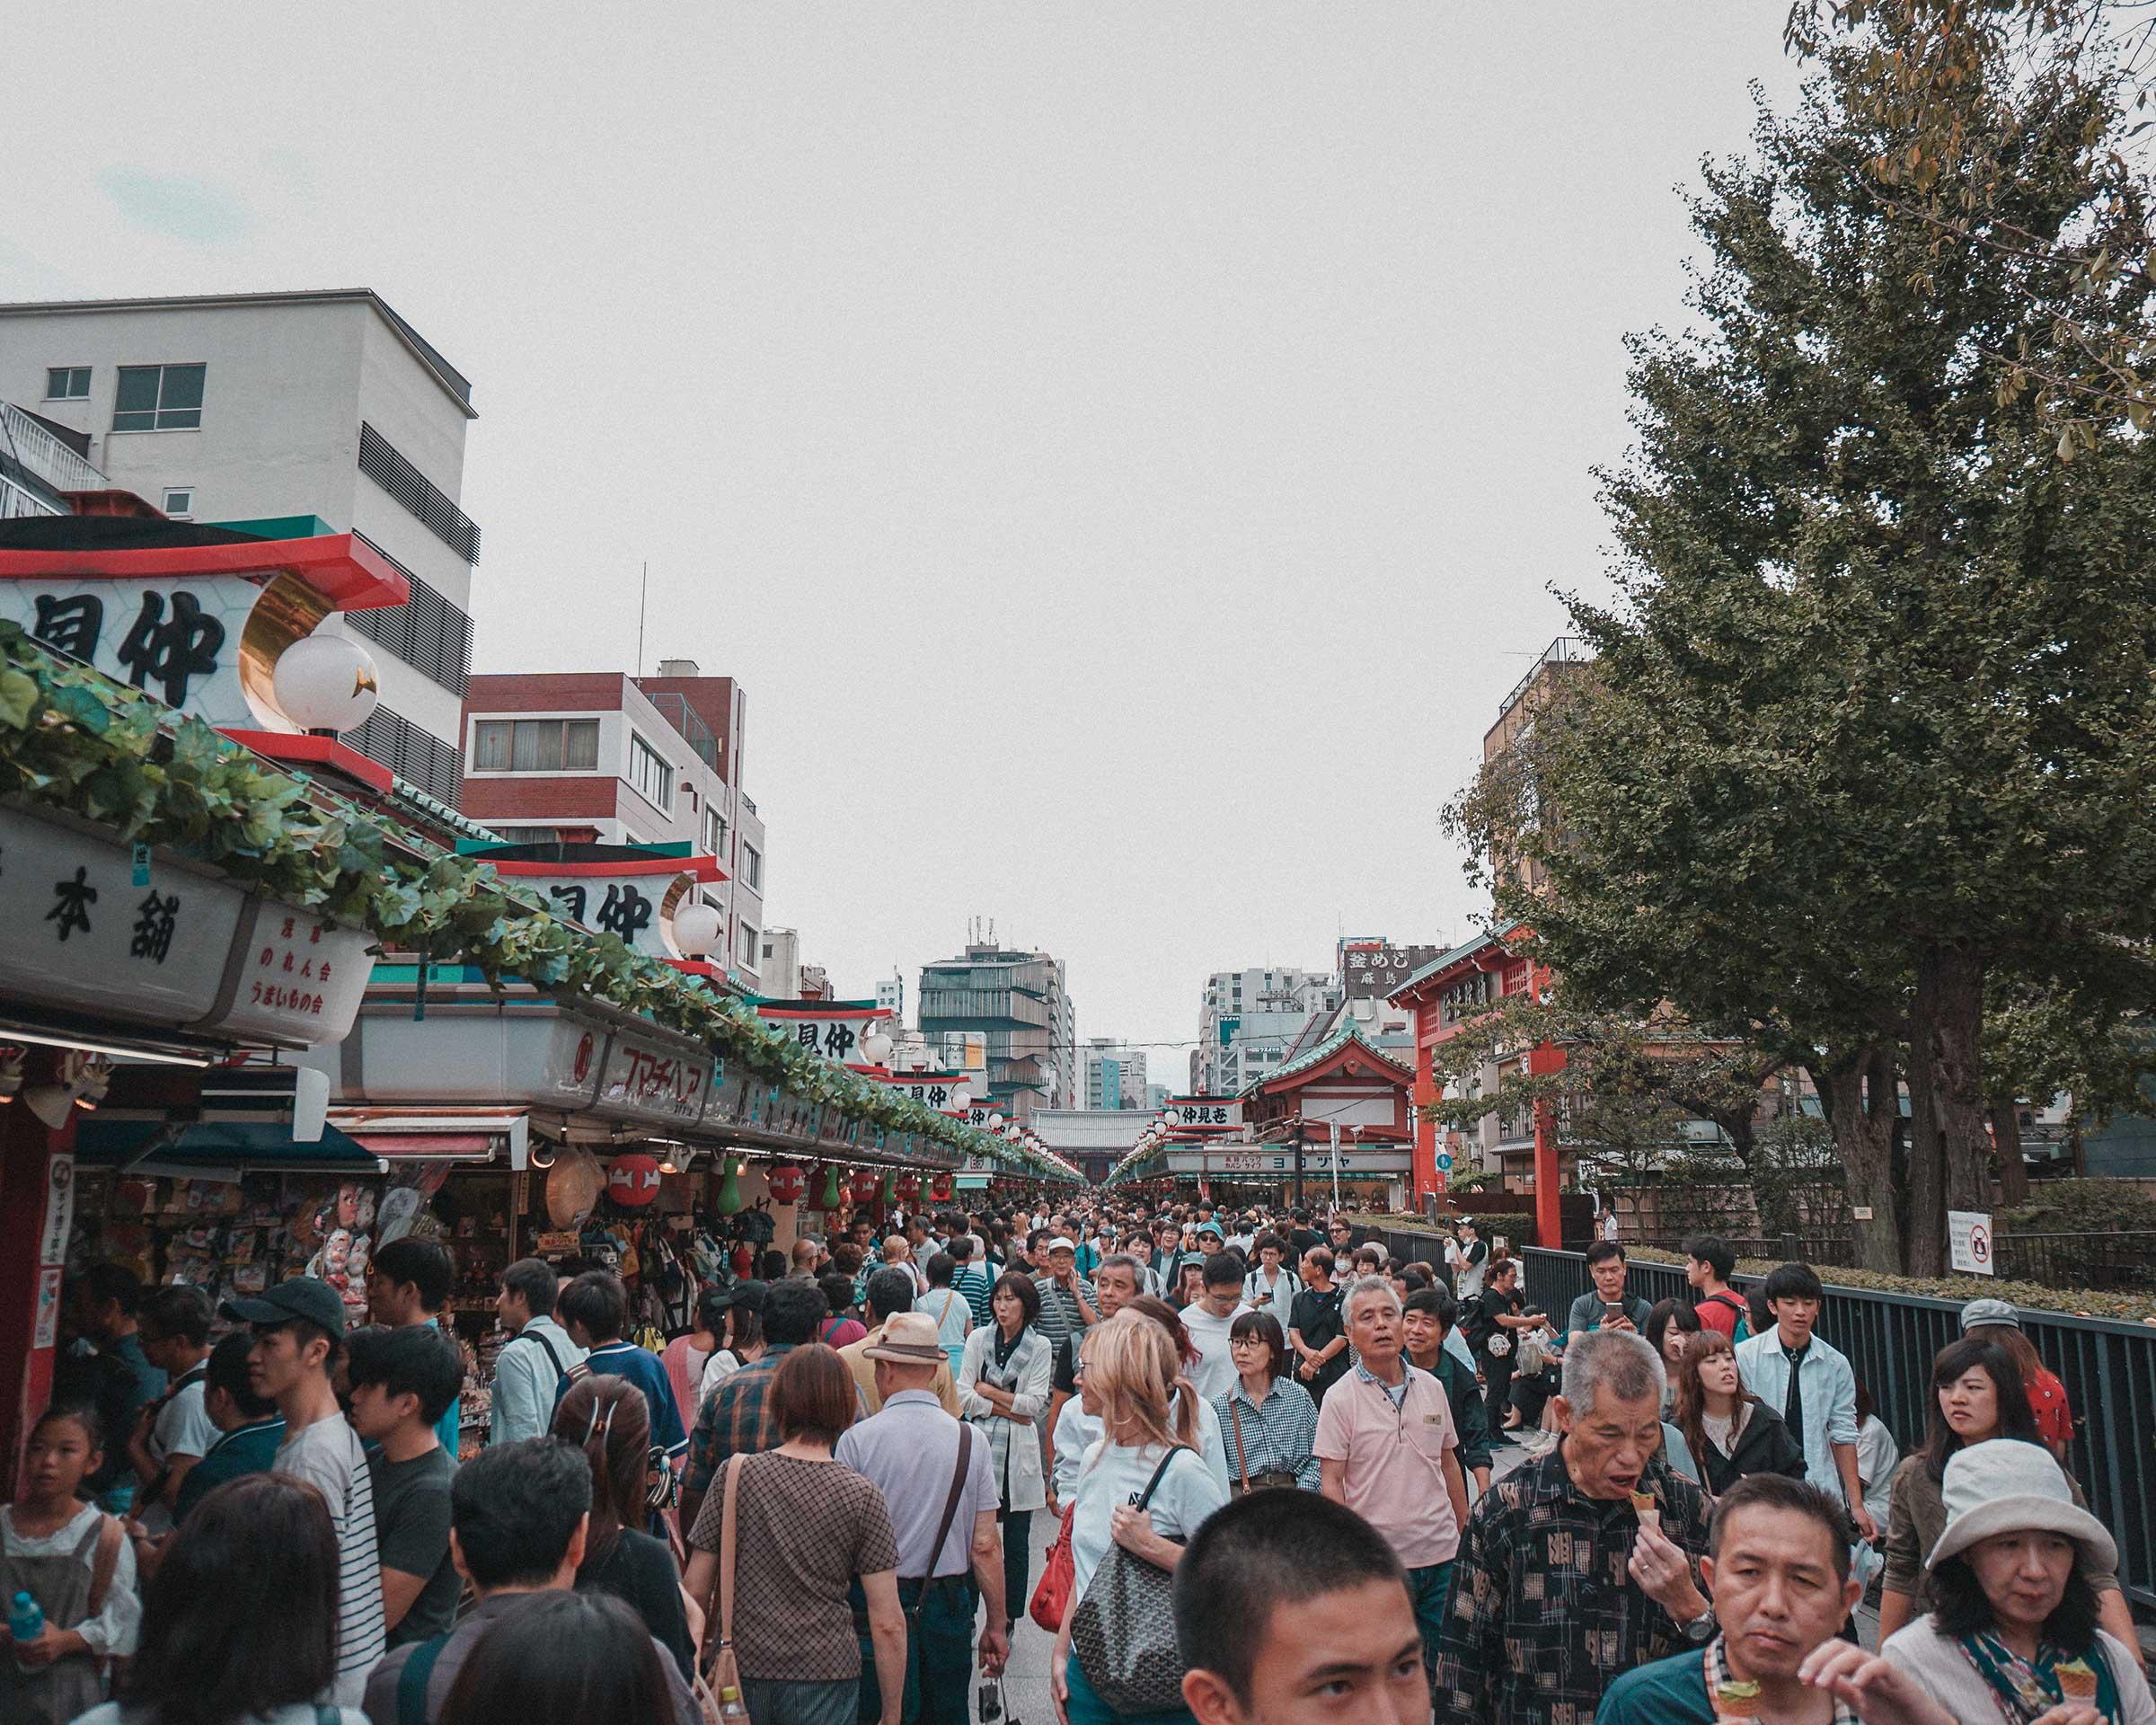 Nakamise Shopping Street (仲見世商店街)